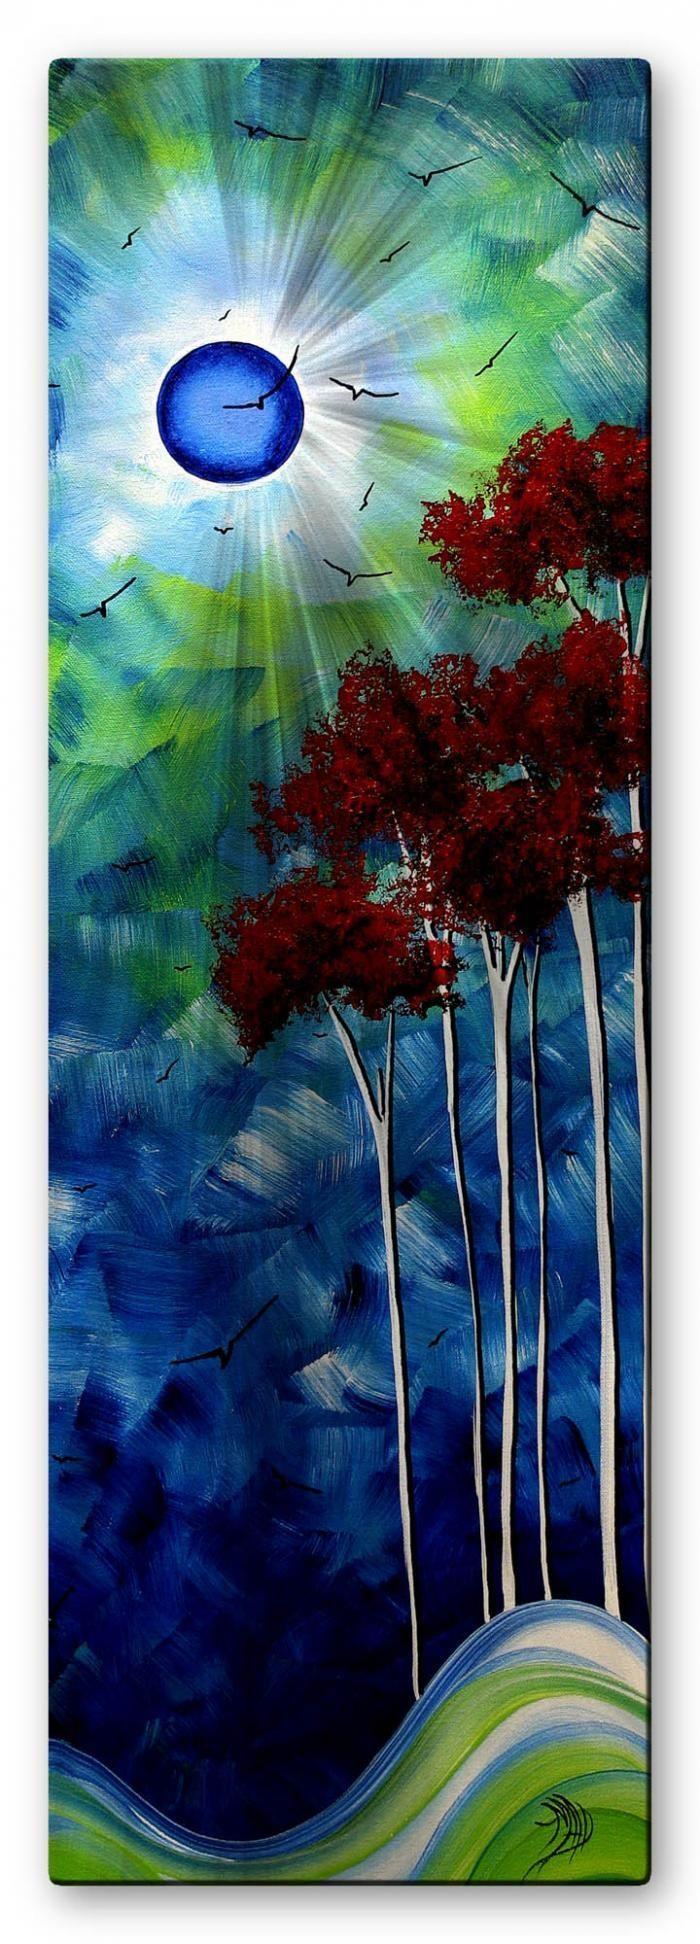 65 Best Artist- Megan Duncanson Images On Pinterest | Abstract Art with regard to Megan Duncanson Metal Wall Art